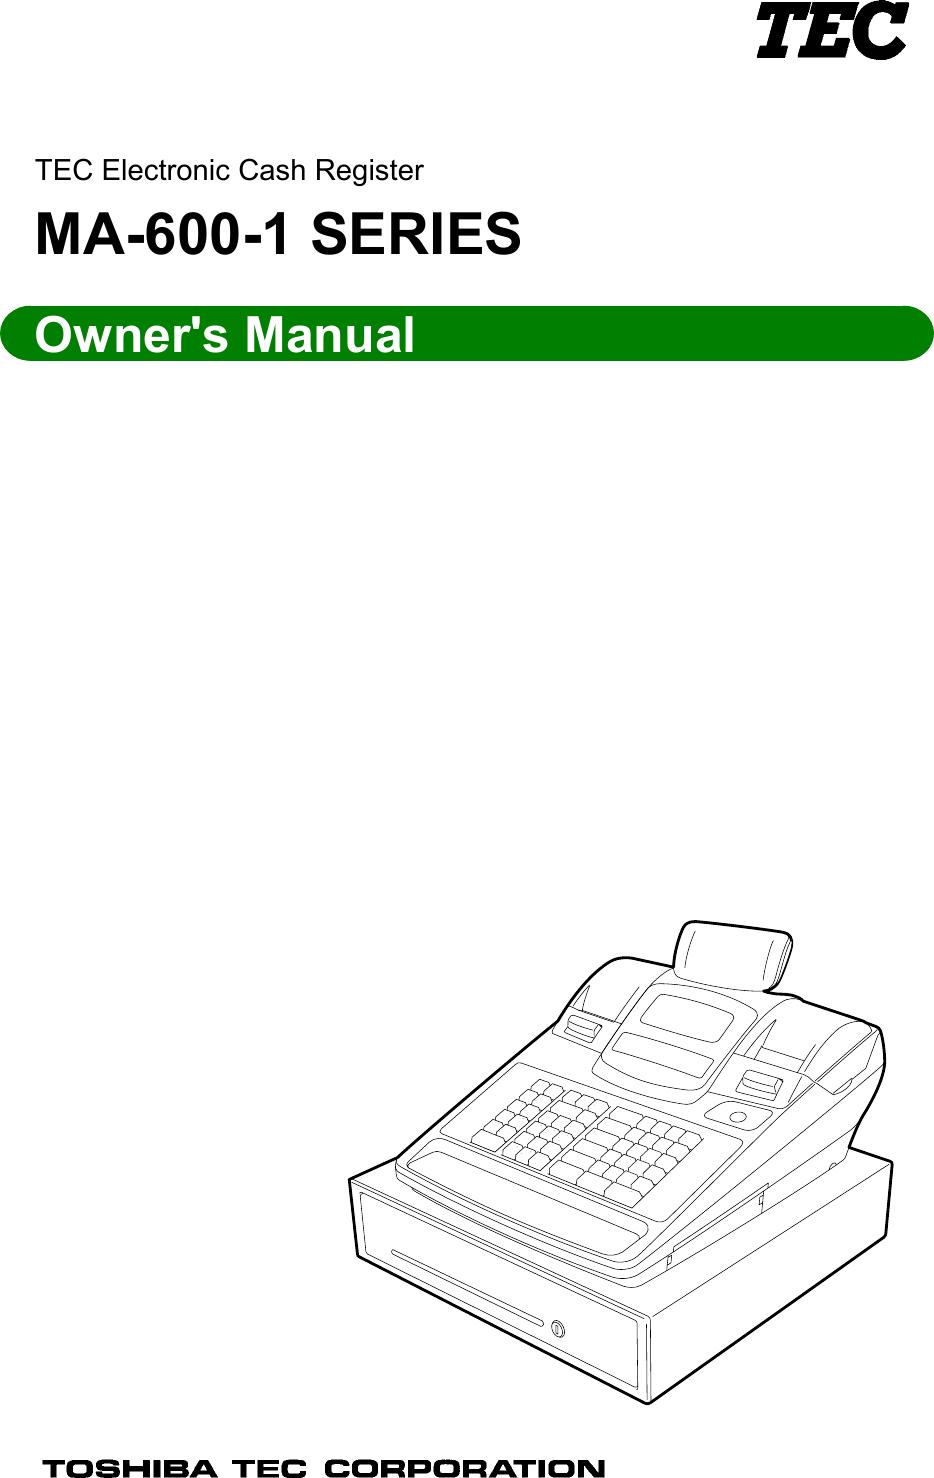 Toshiba Tec Ma 600 1 Users Manual Owner's (EO1 11155A